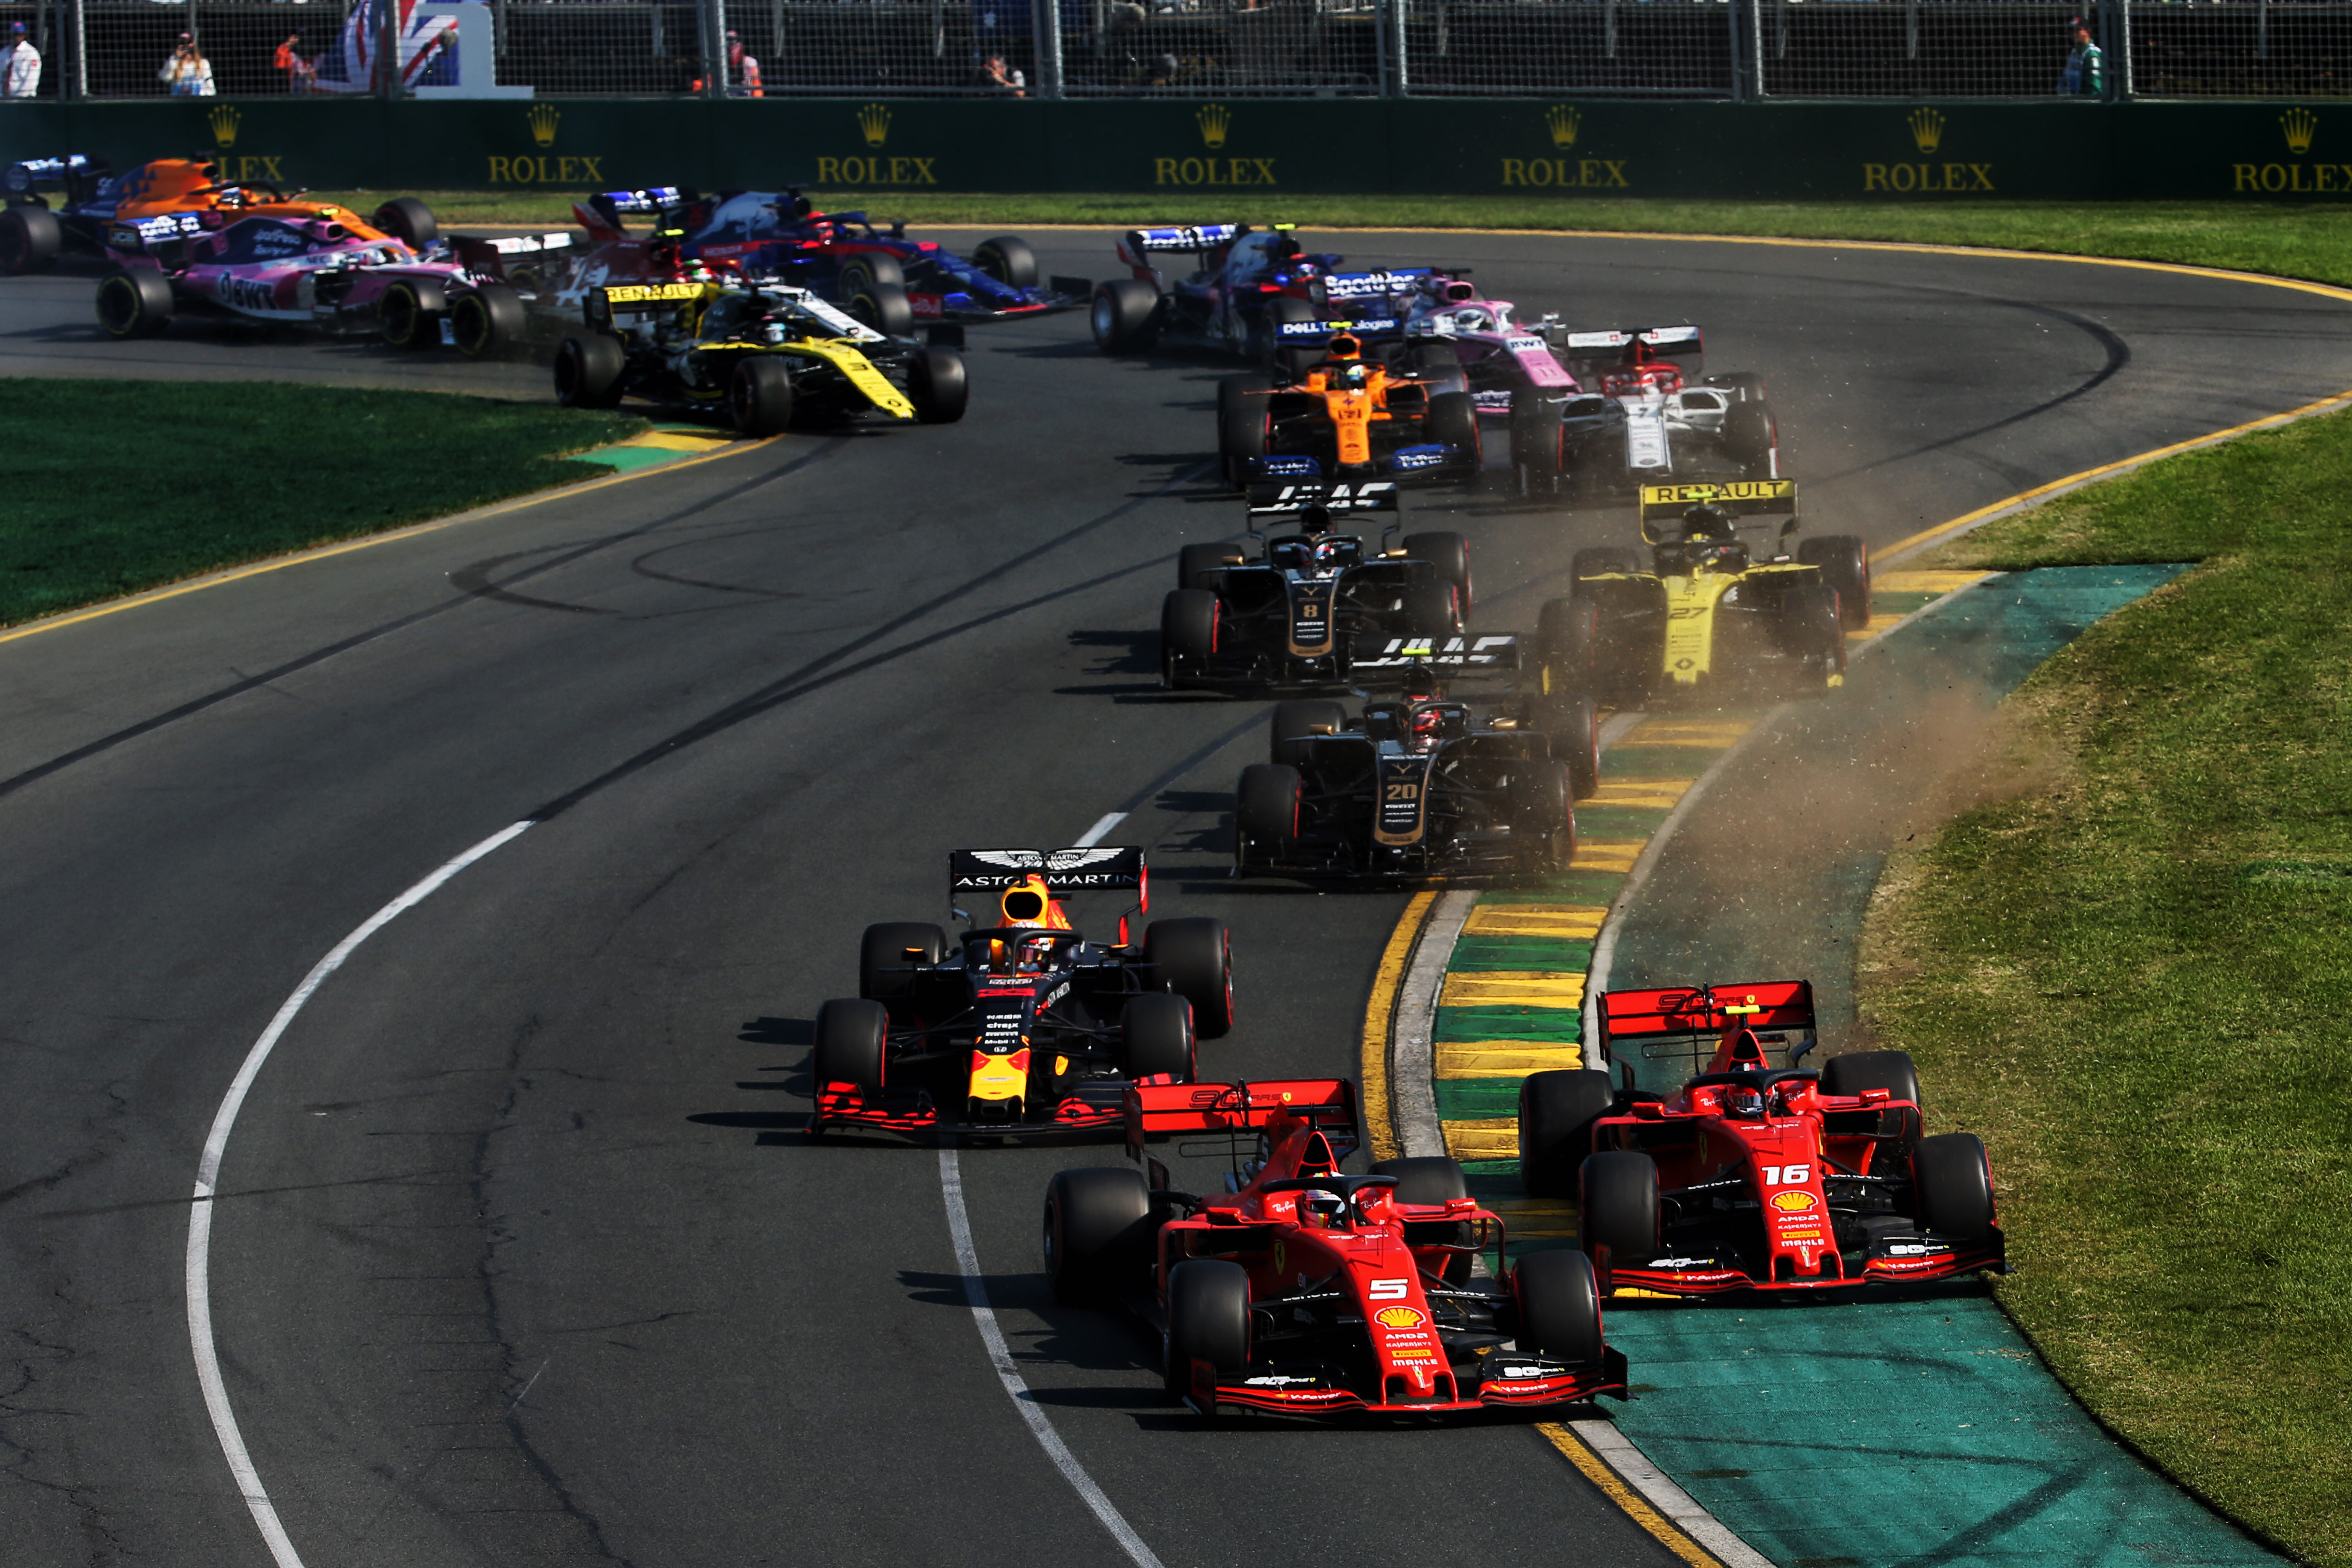 Motor Racing Formula One World Championship Australian Grand Prix Race Day Melbourne, Australia